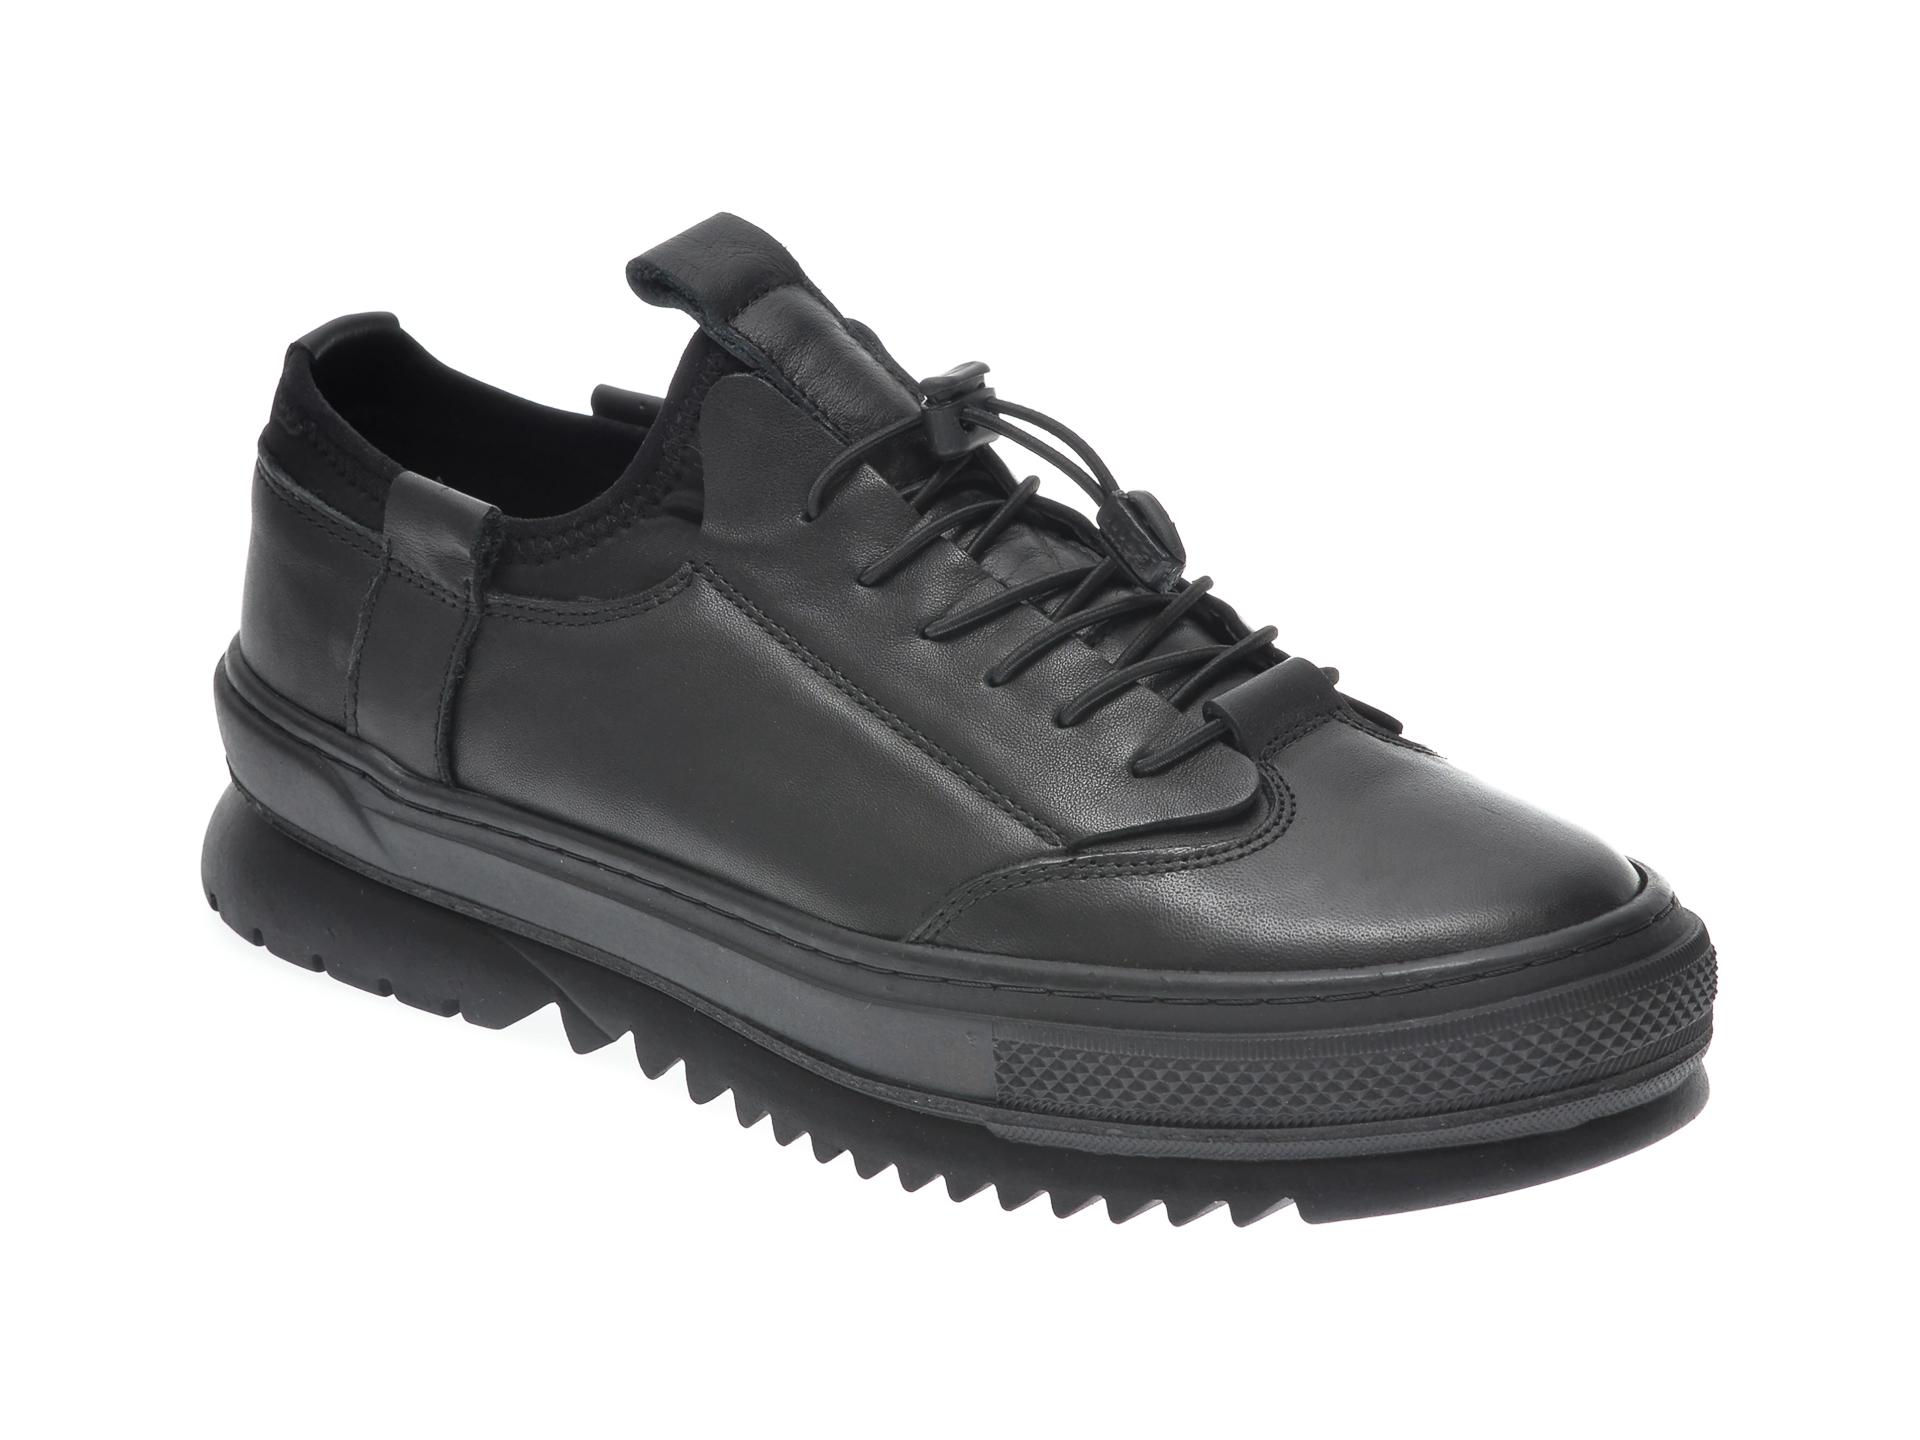 Pantofi OTTER negri, 4029, din piele naturala